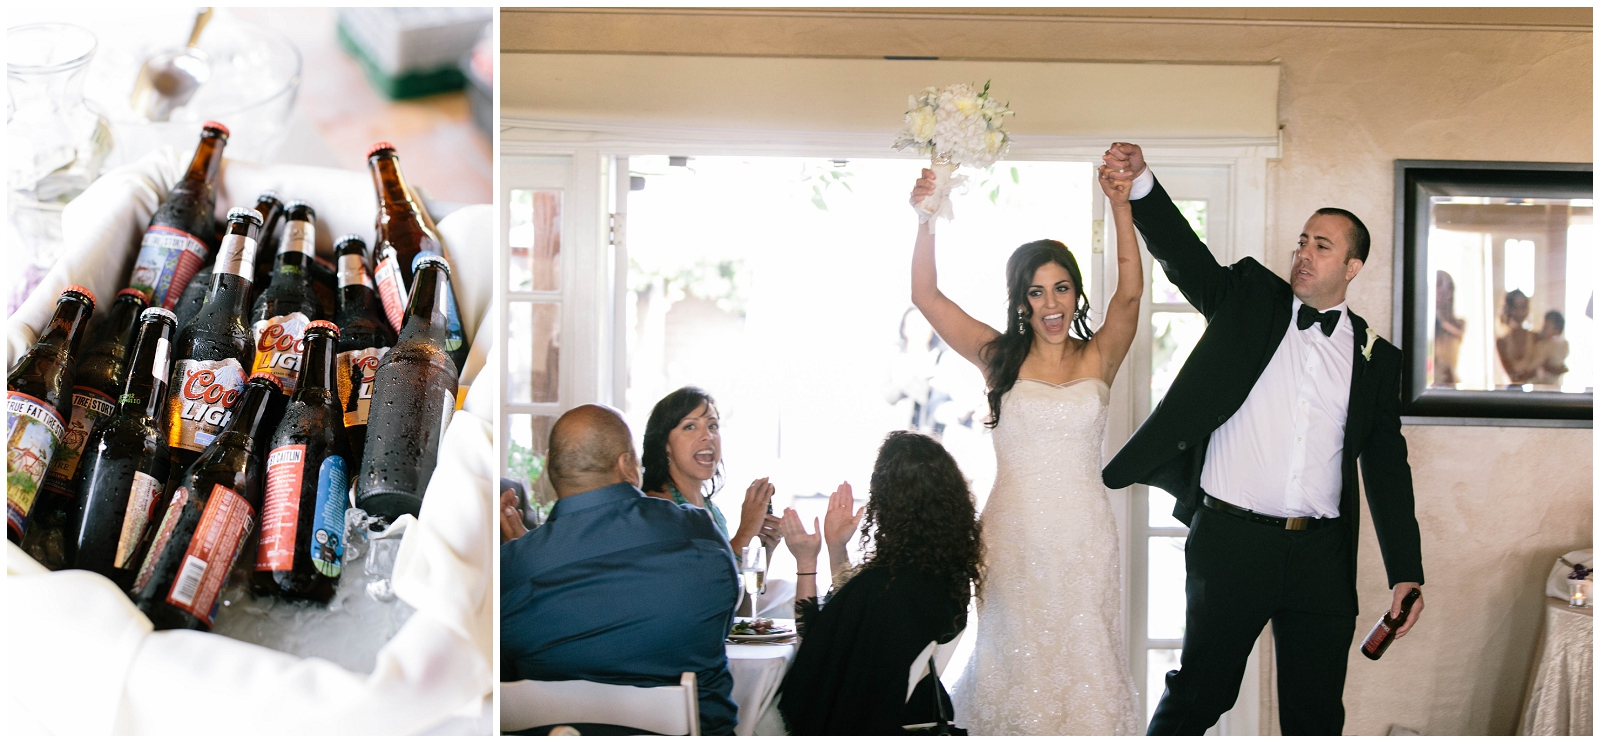 San-Francisco-Bay-Area-Wedding-Photography-Kennolyn-11.jpg